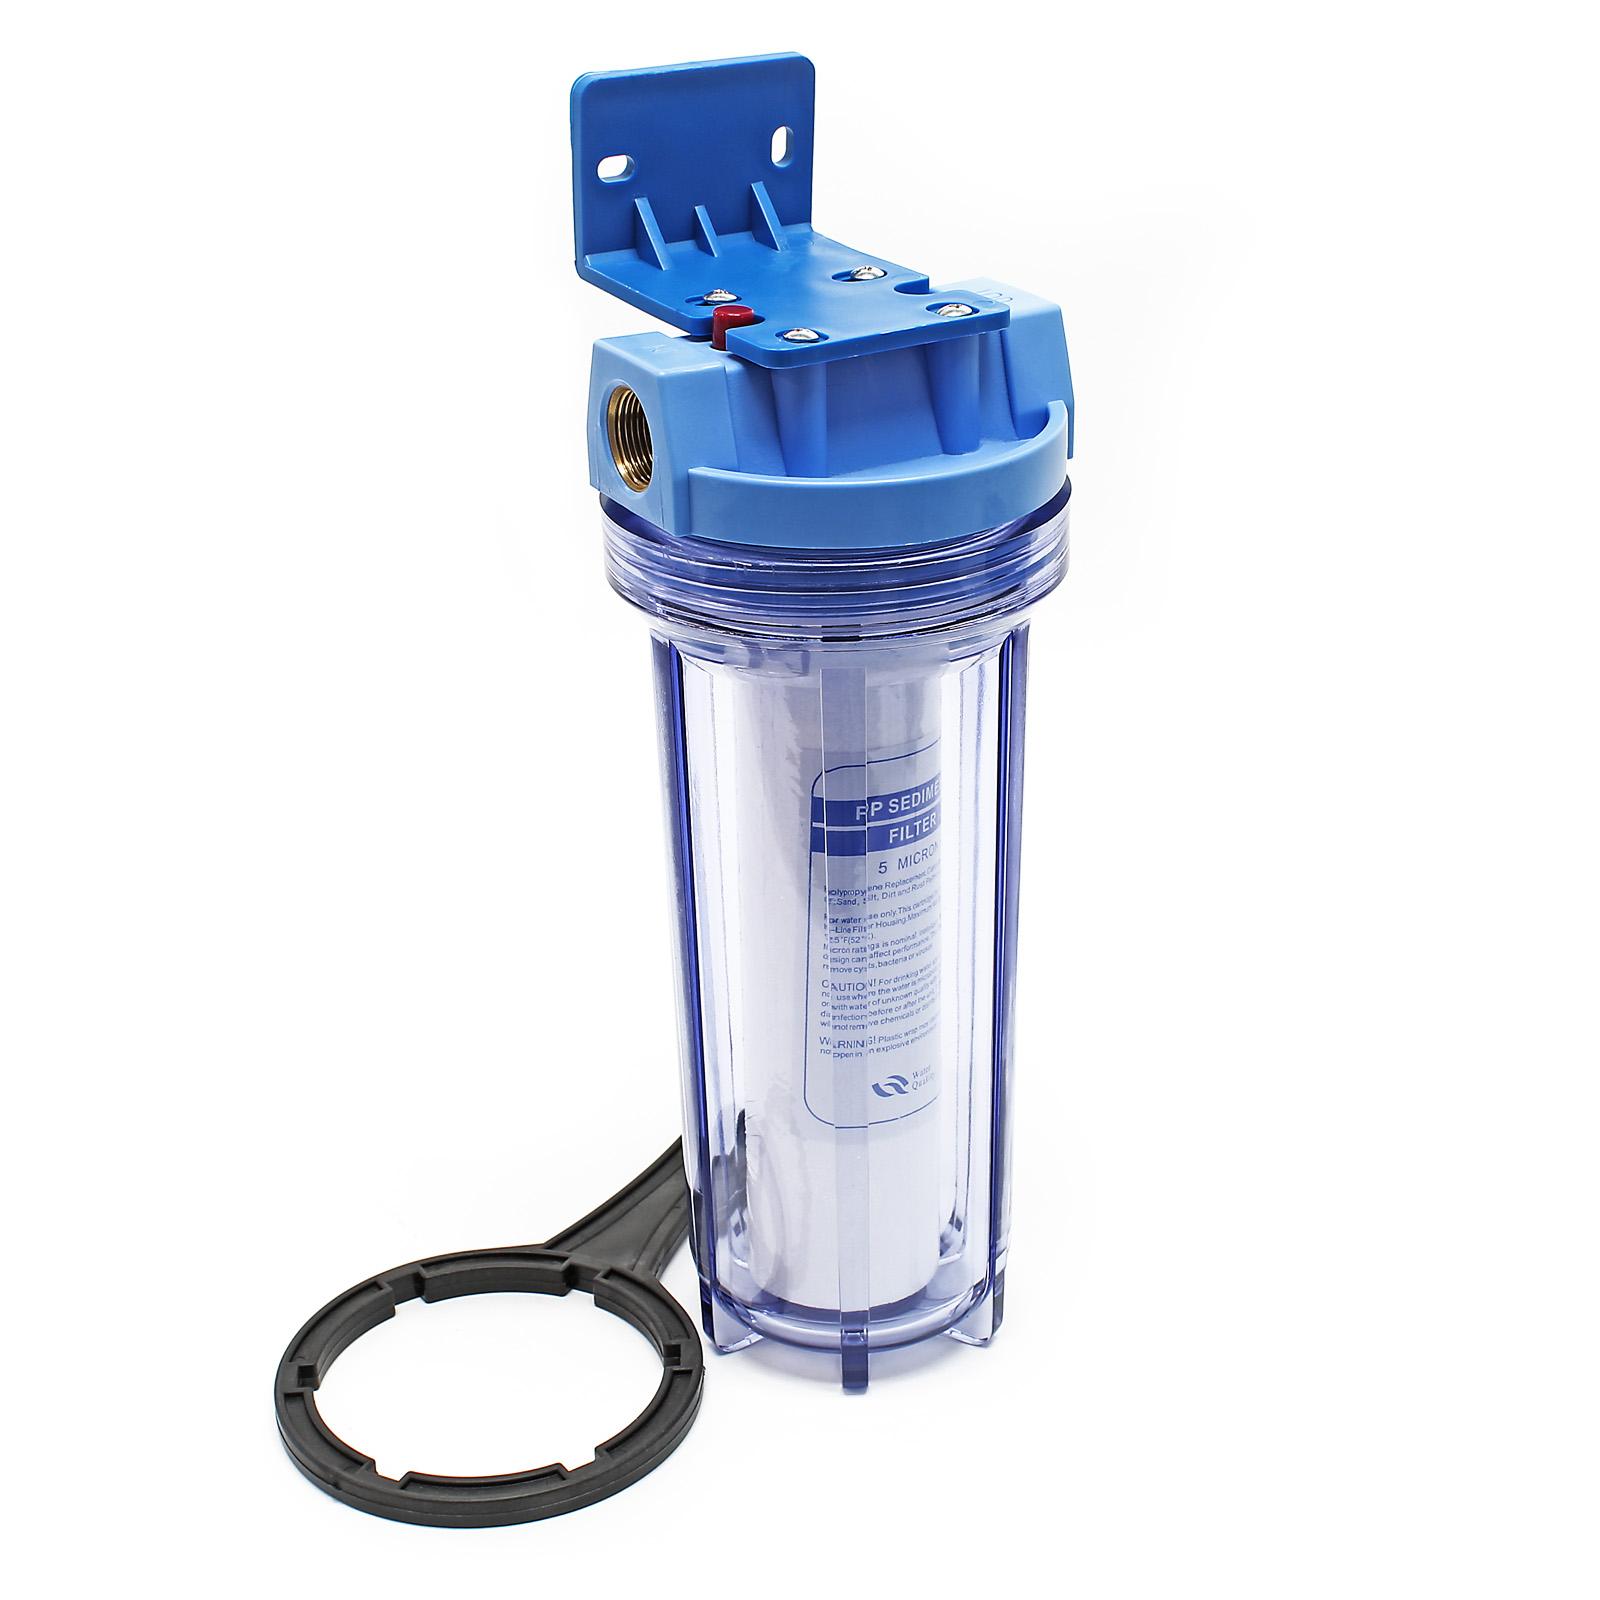 Naturewater 26,16 mm 3/4 Zoll 1-stufiger Wasserfilter